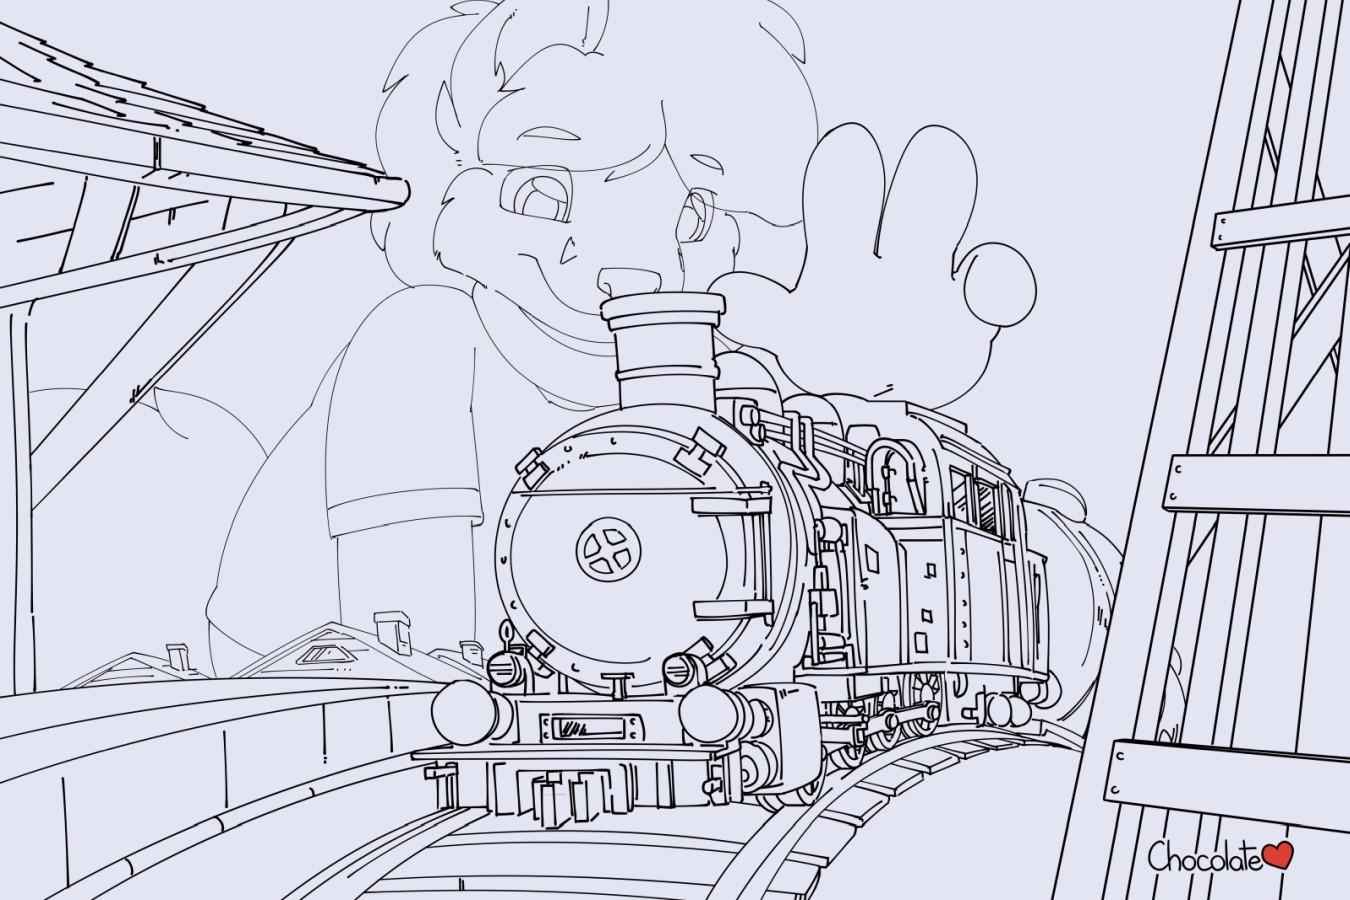 e926 anthro austin canine chocolatekitsune forced_perspective fox locomotive macro mammal solo steam_locomotive toy toy_train train vehicle